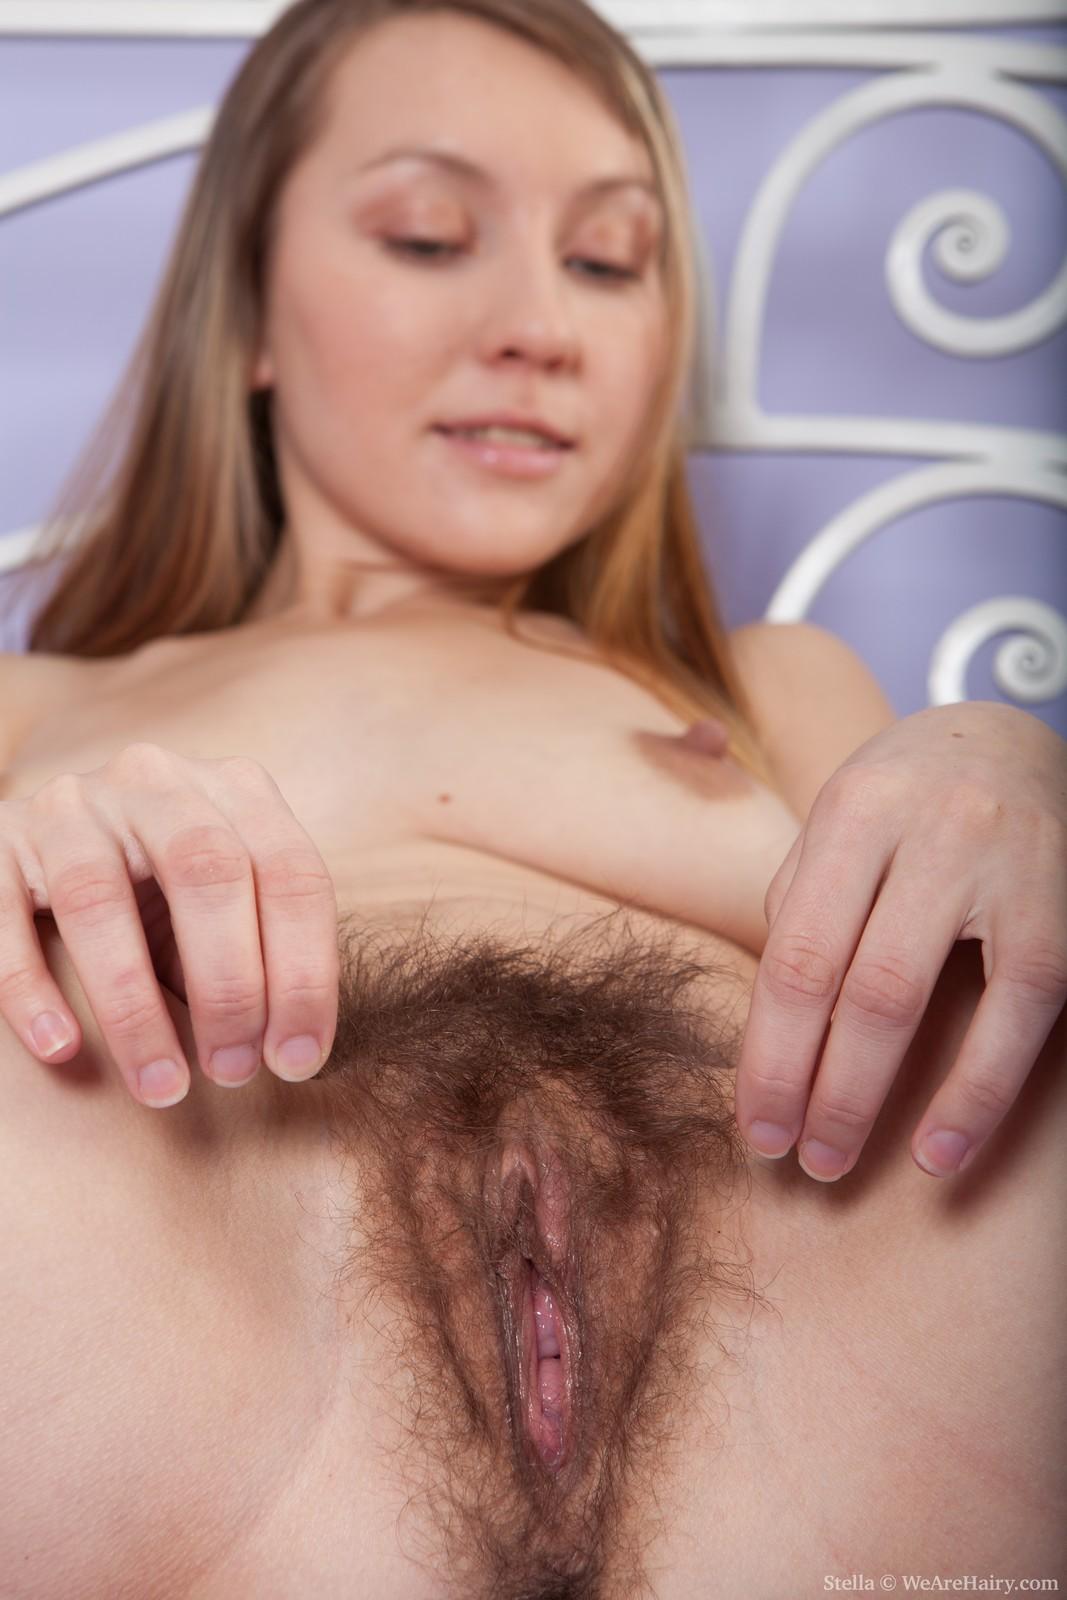 bushy cunt on a sexy girl - hairypussy.photos